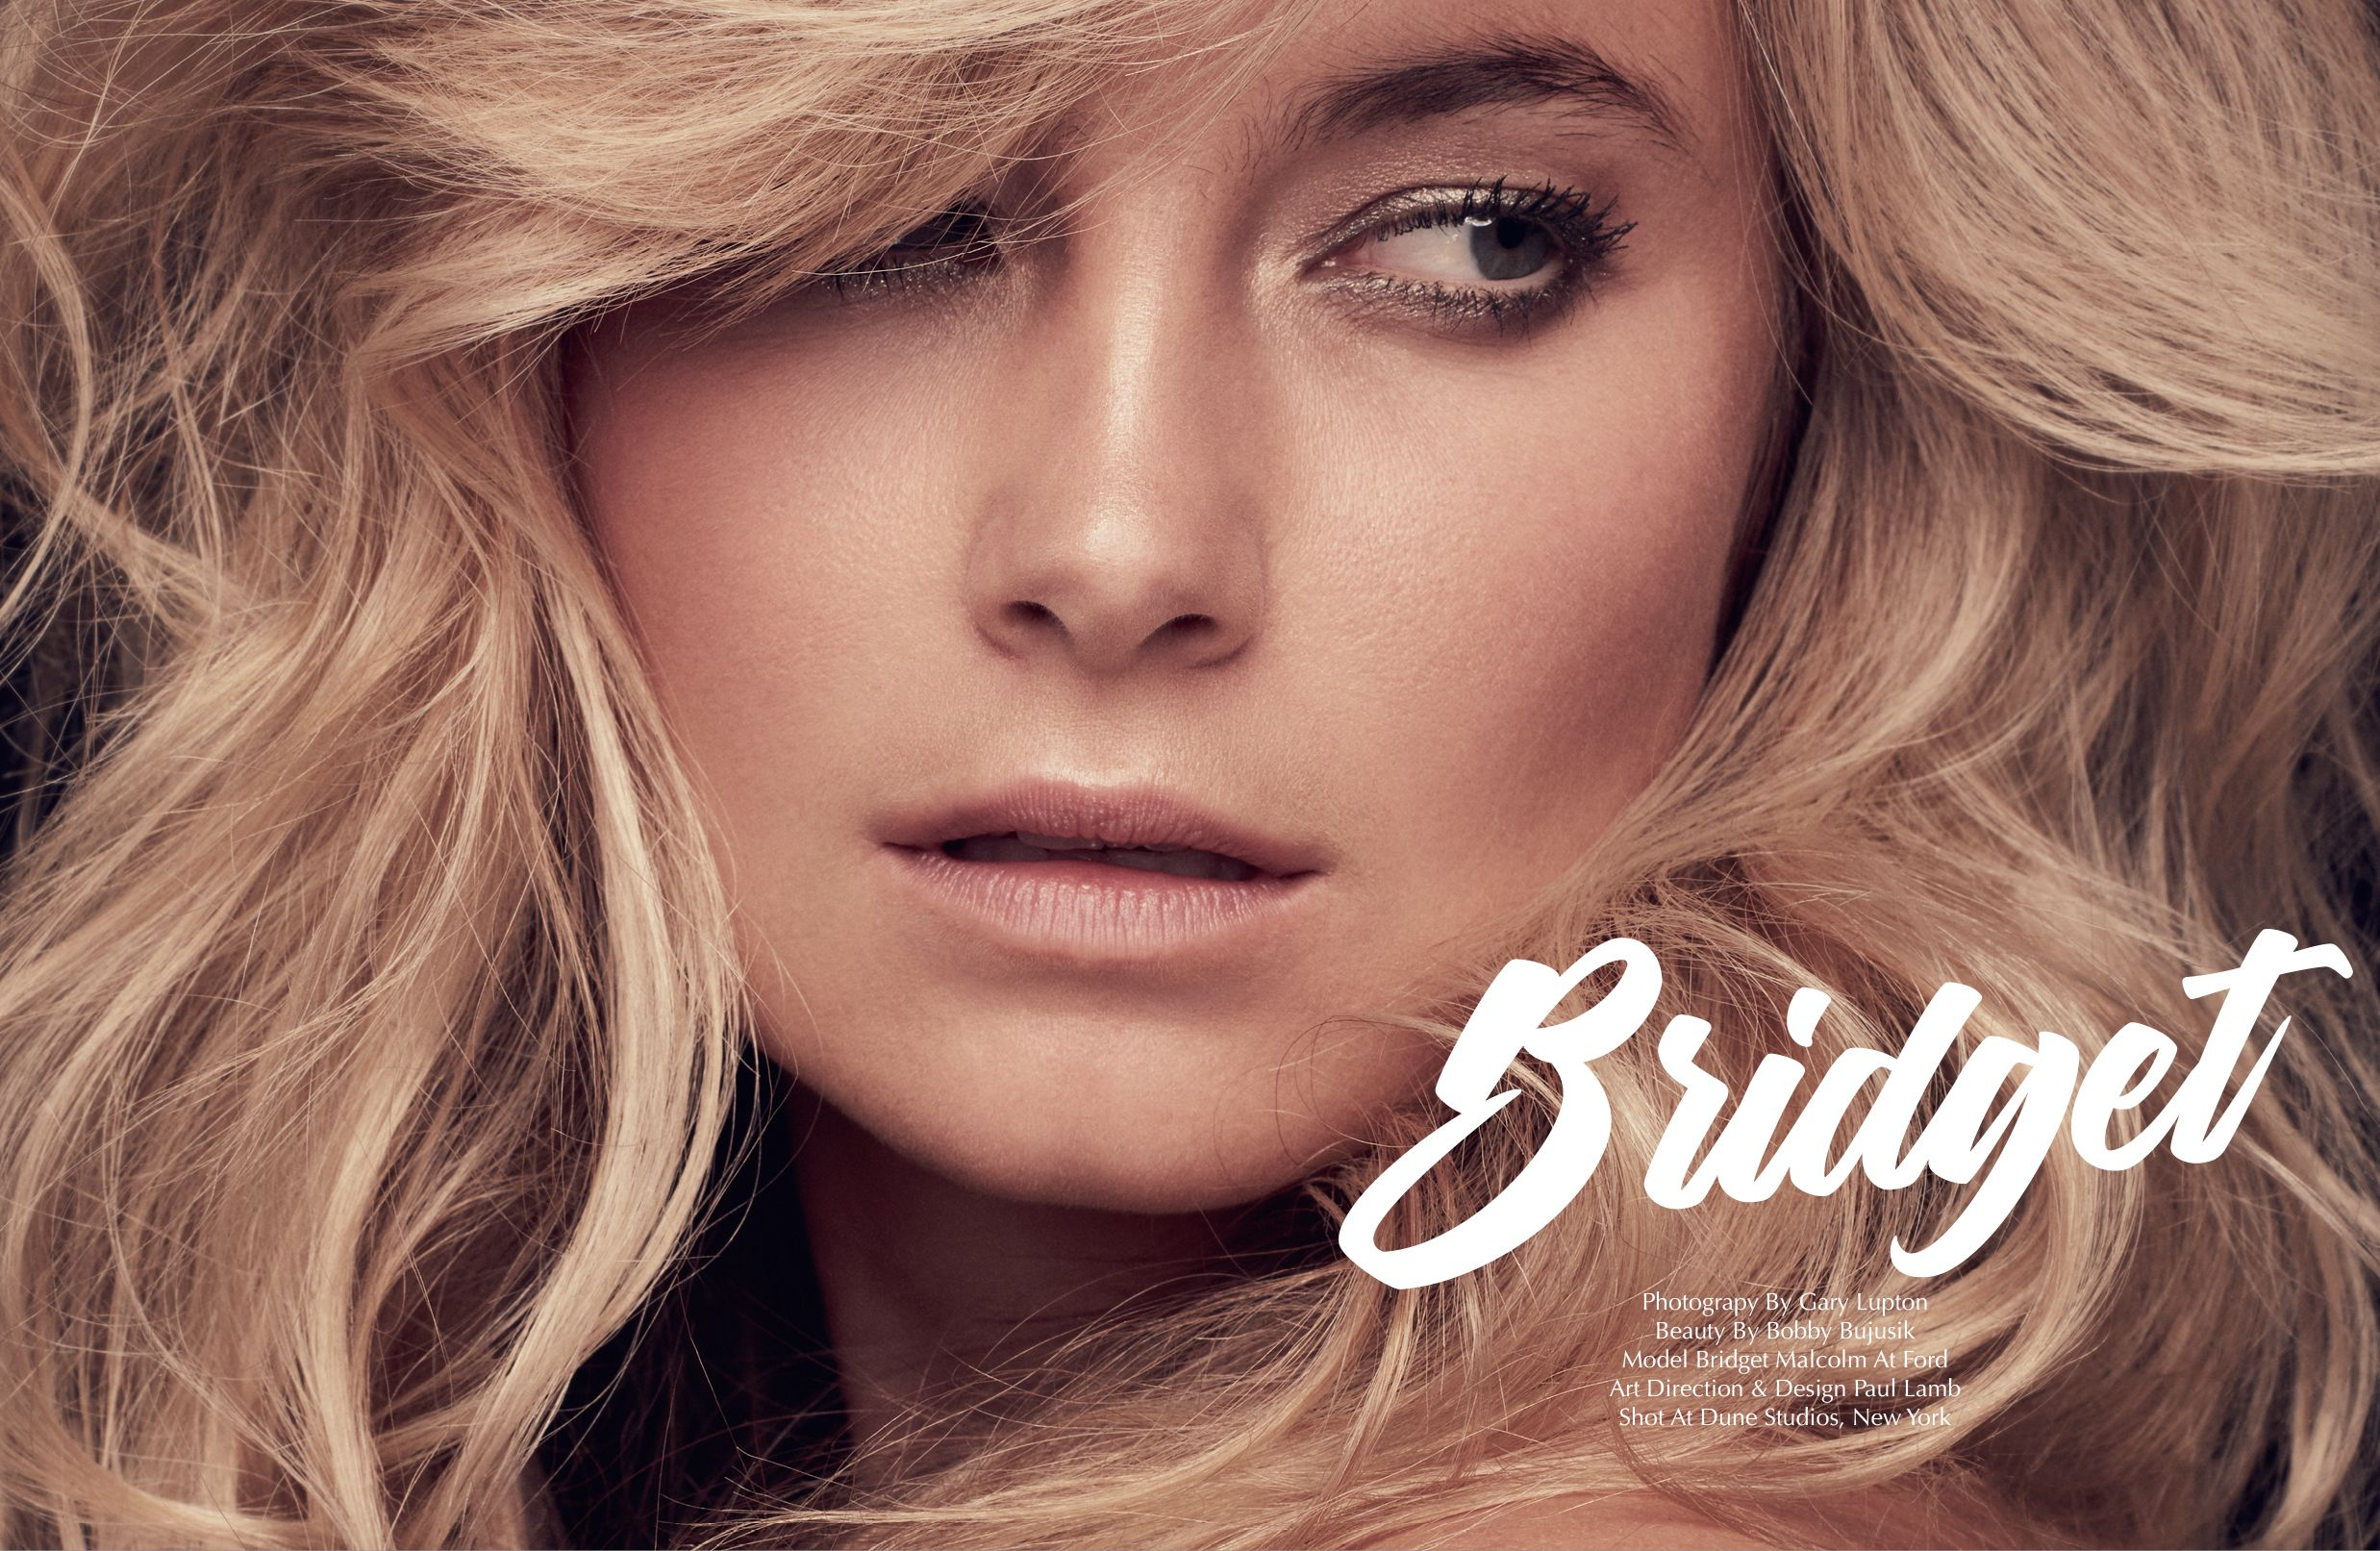 Bridget_Story2.jpg